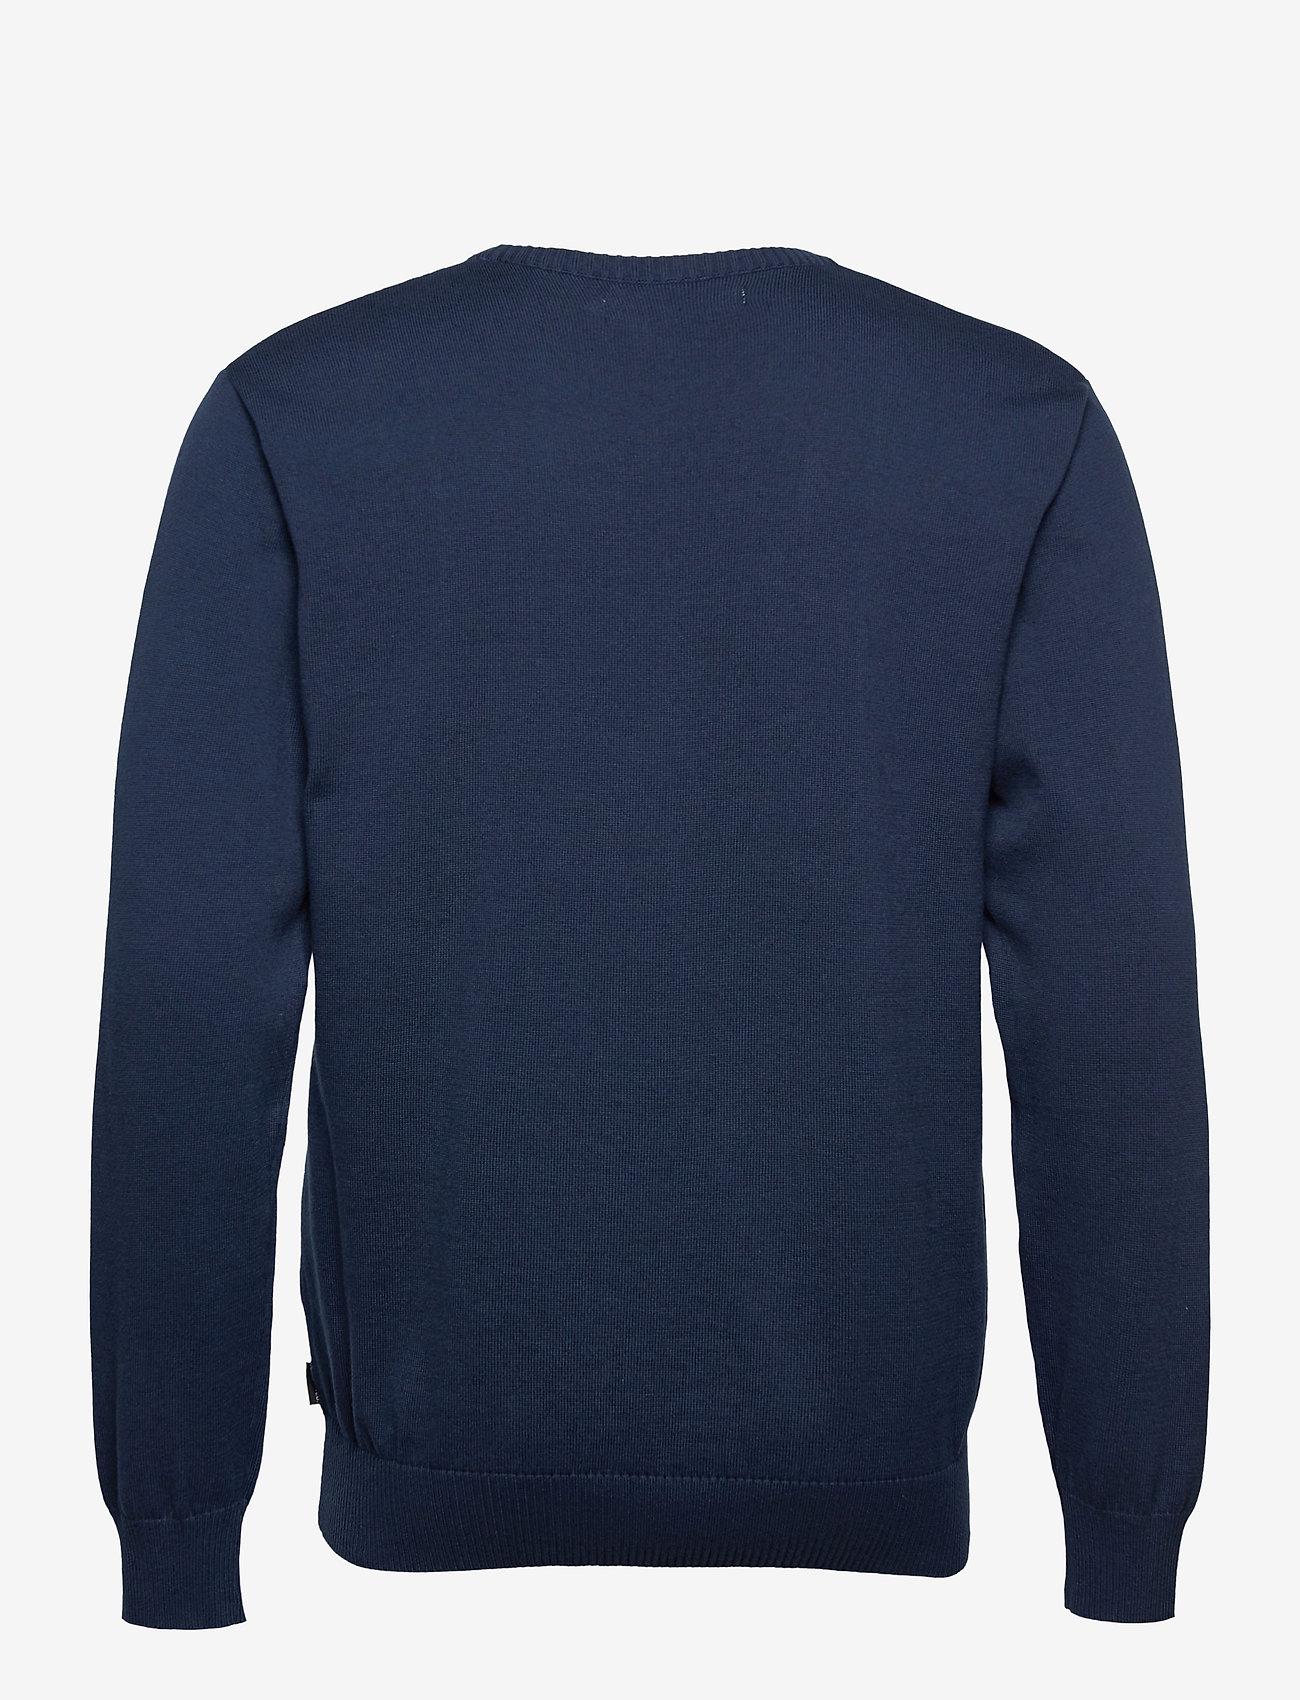 DEDICATED - Sweater Mora Snoopy Navy - truien met ronde hals - black iris - 1